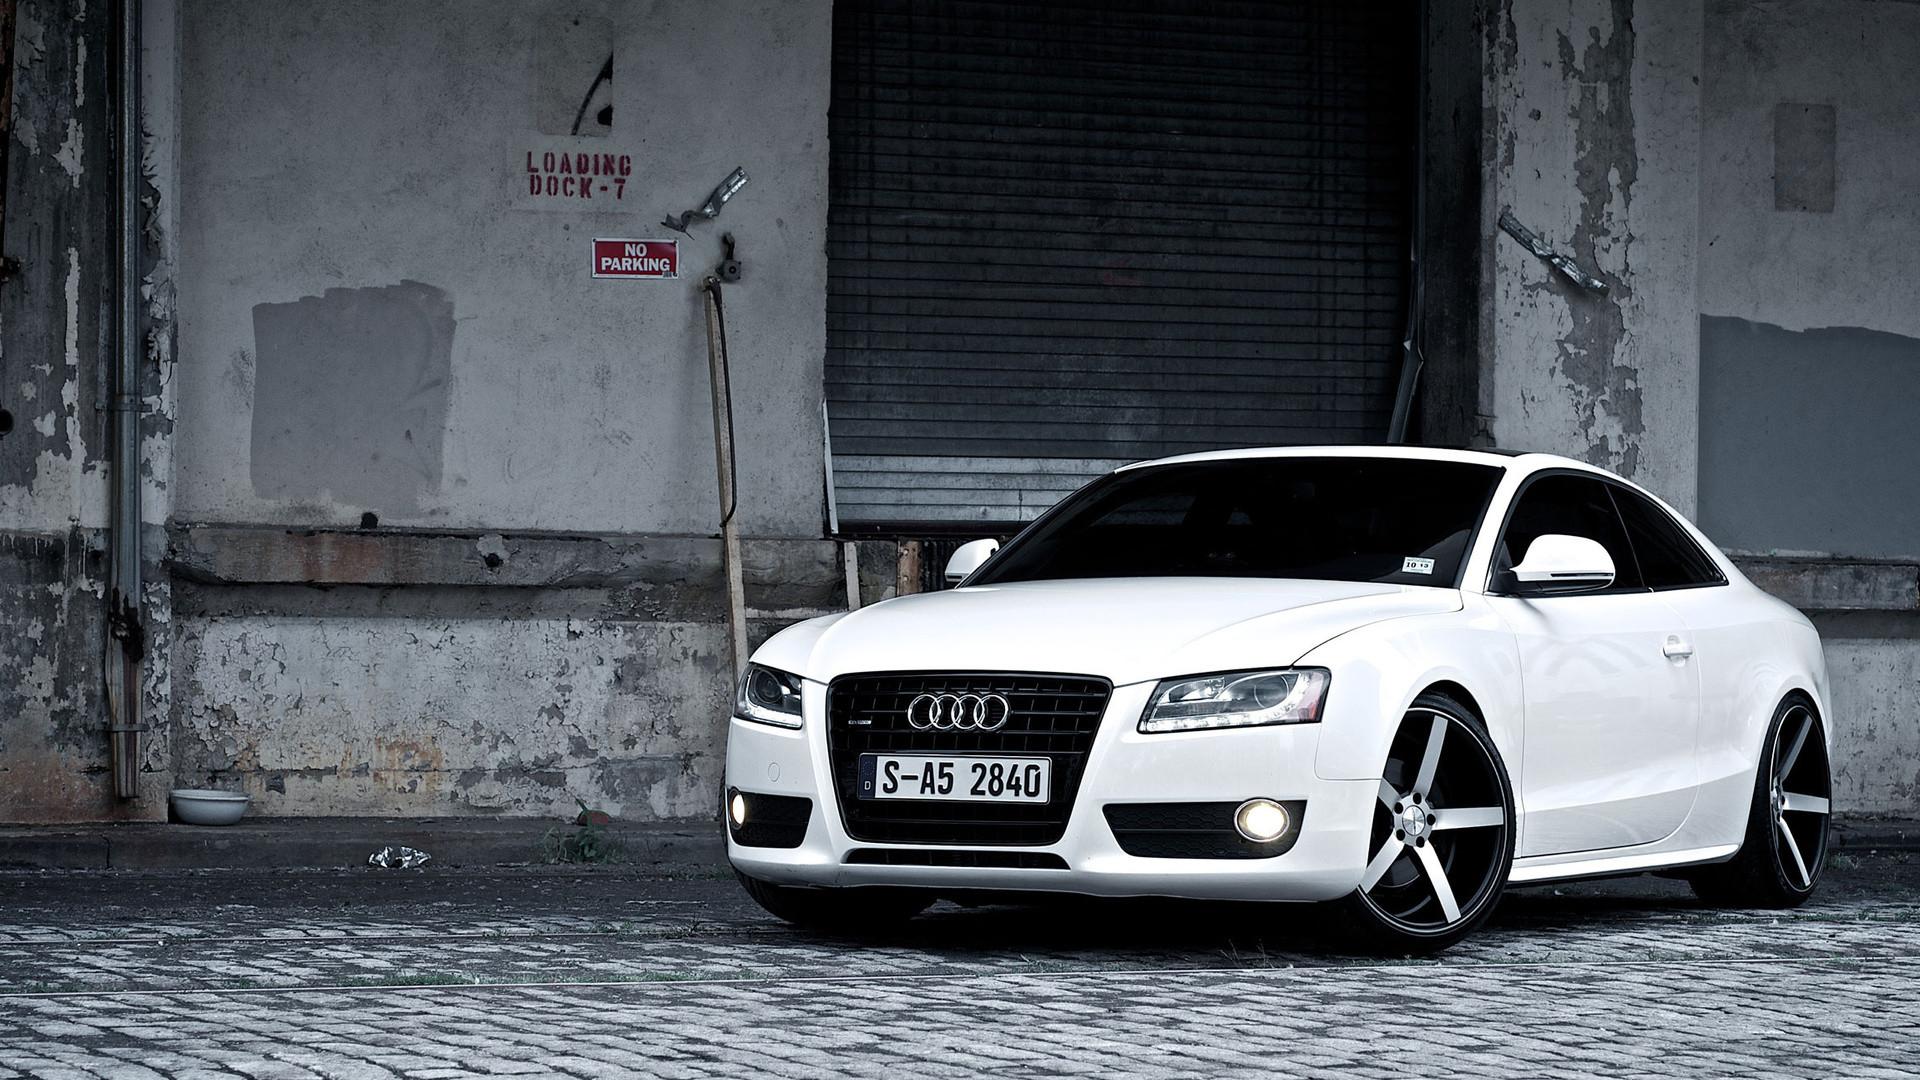 Res: 1920x1080, Audi S5 White Wallpaper